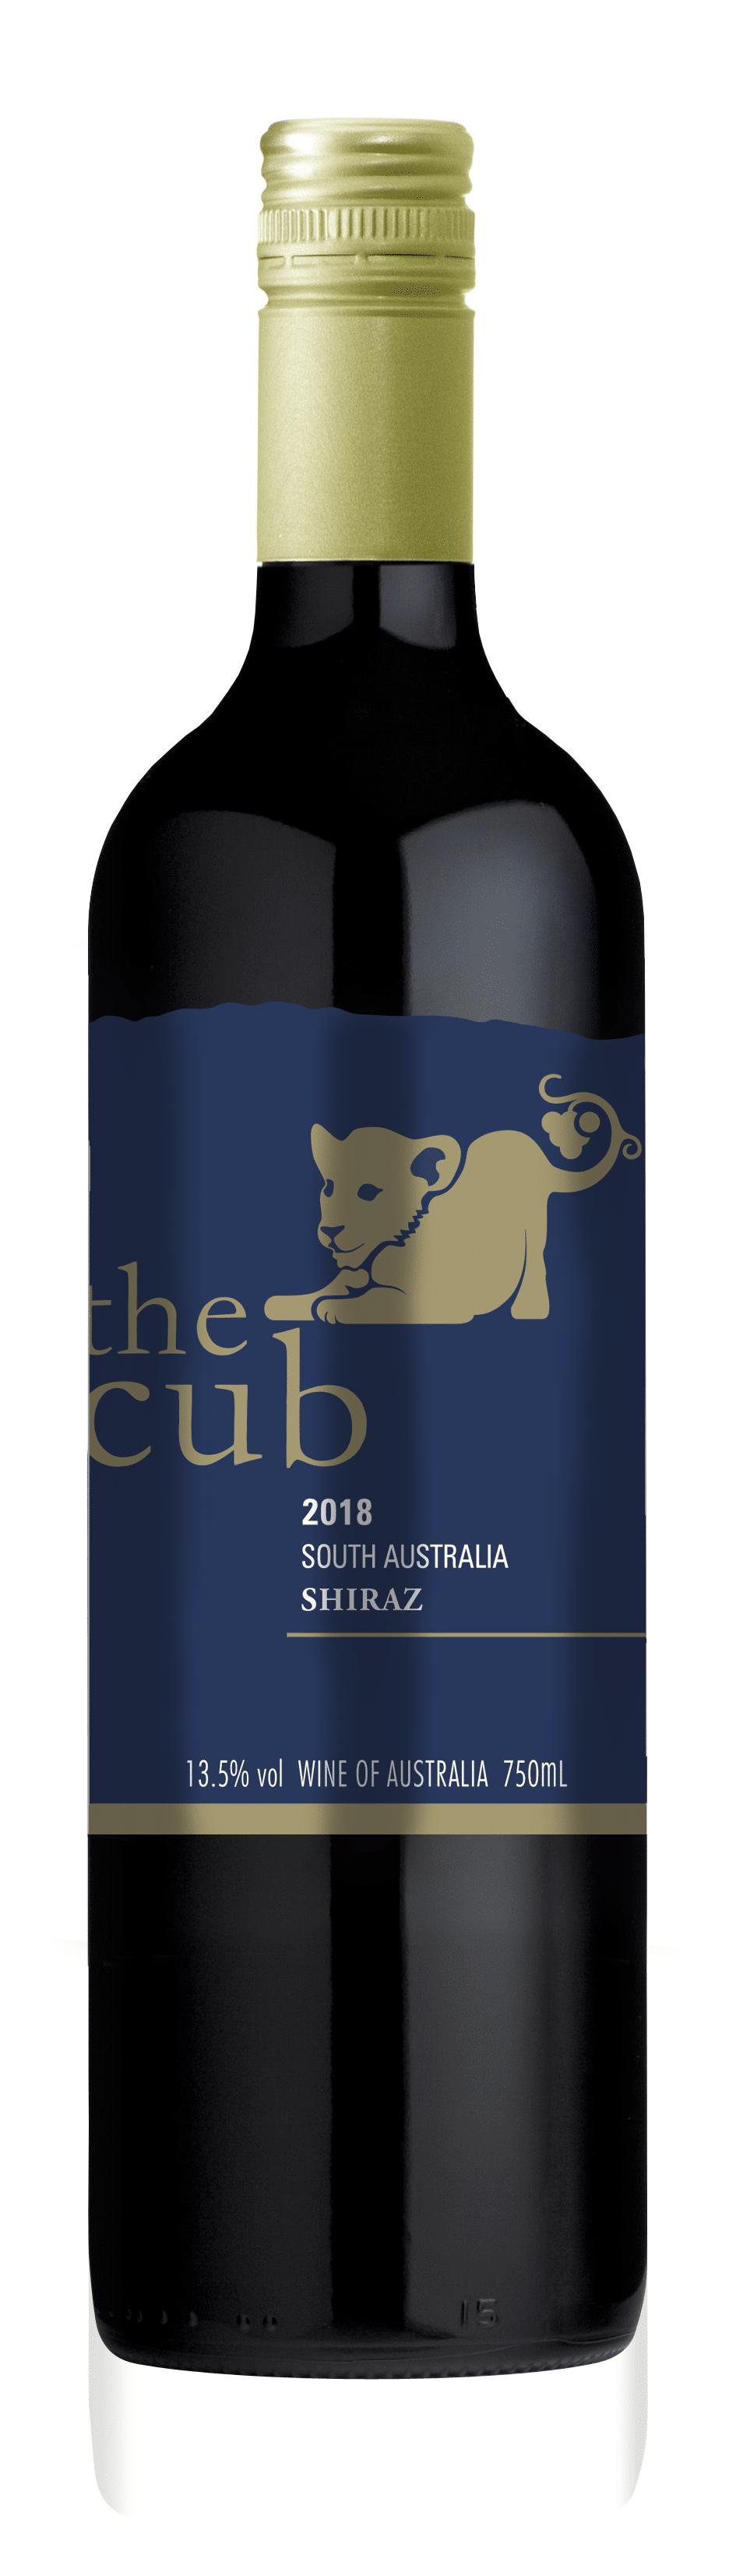 The Cub Shiraz South Australia